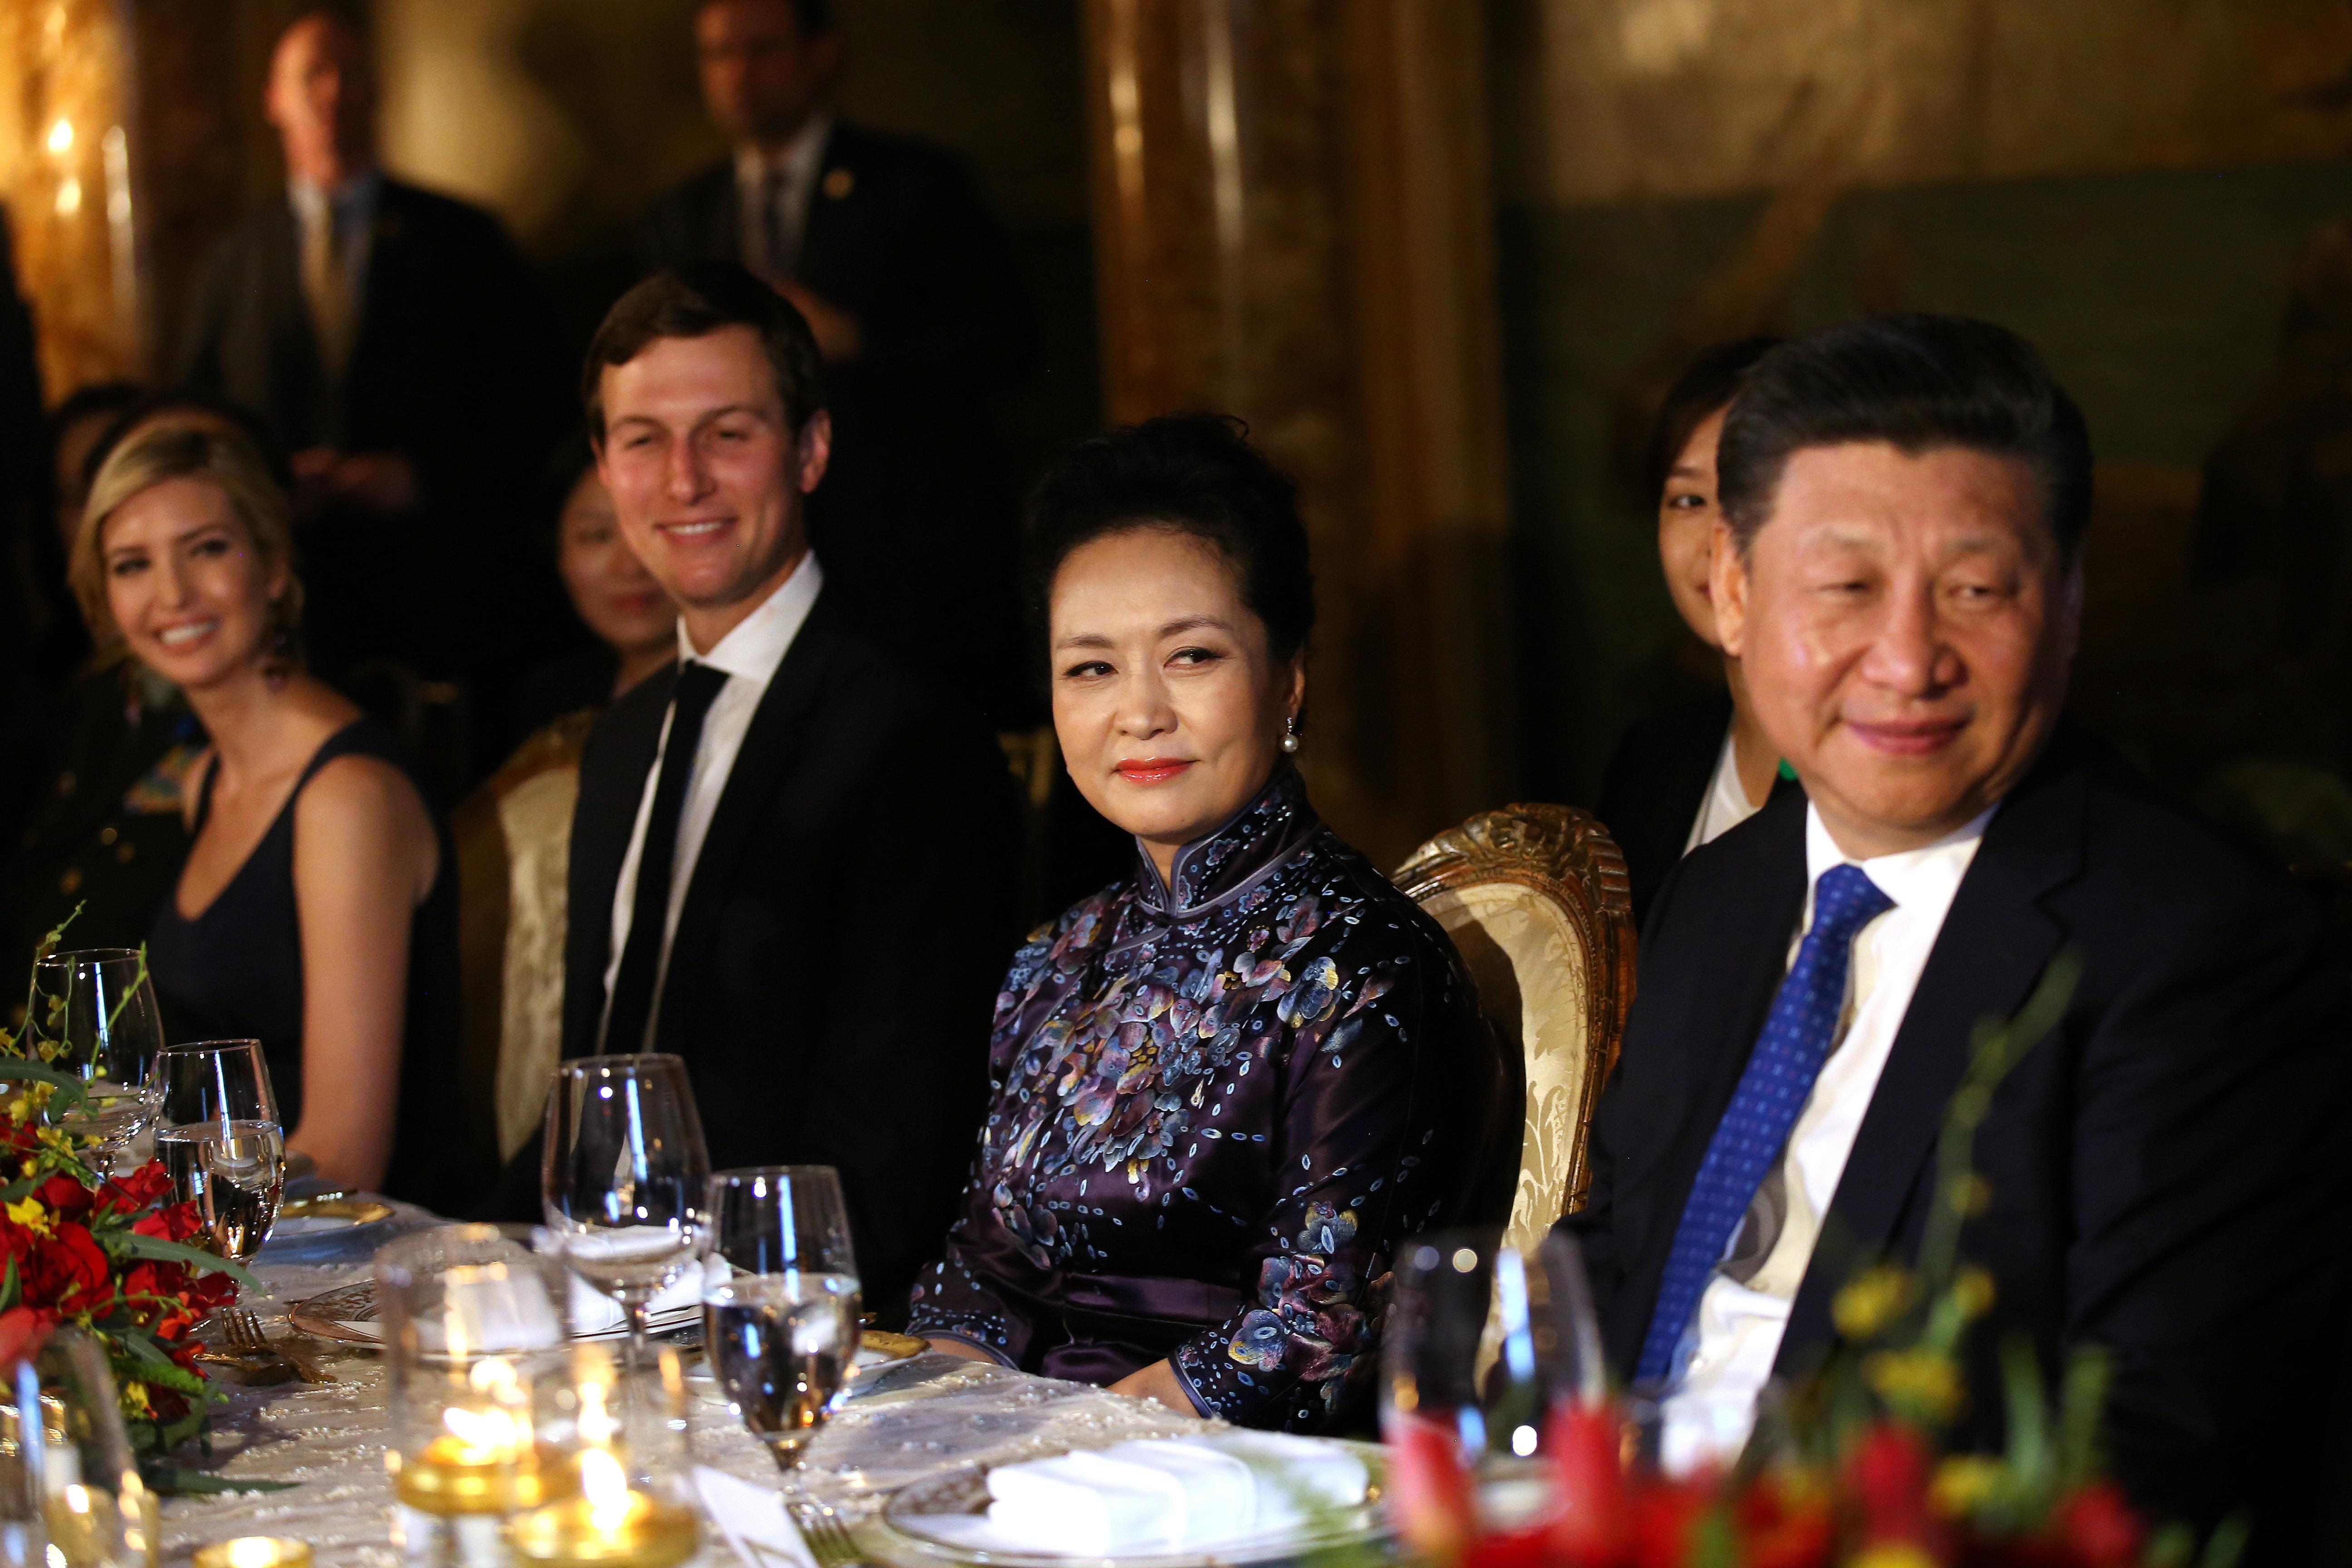 Chinese first lady Peng Liyuan and Chinese President Xi Jinping sit next to Jared Kushner and Ivanka Trump at Trump's Mar-a-L